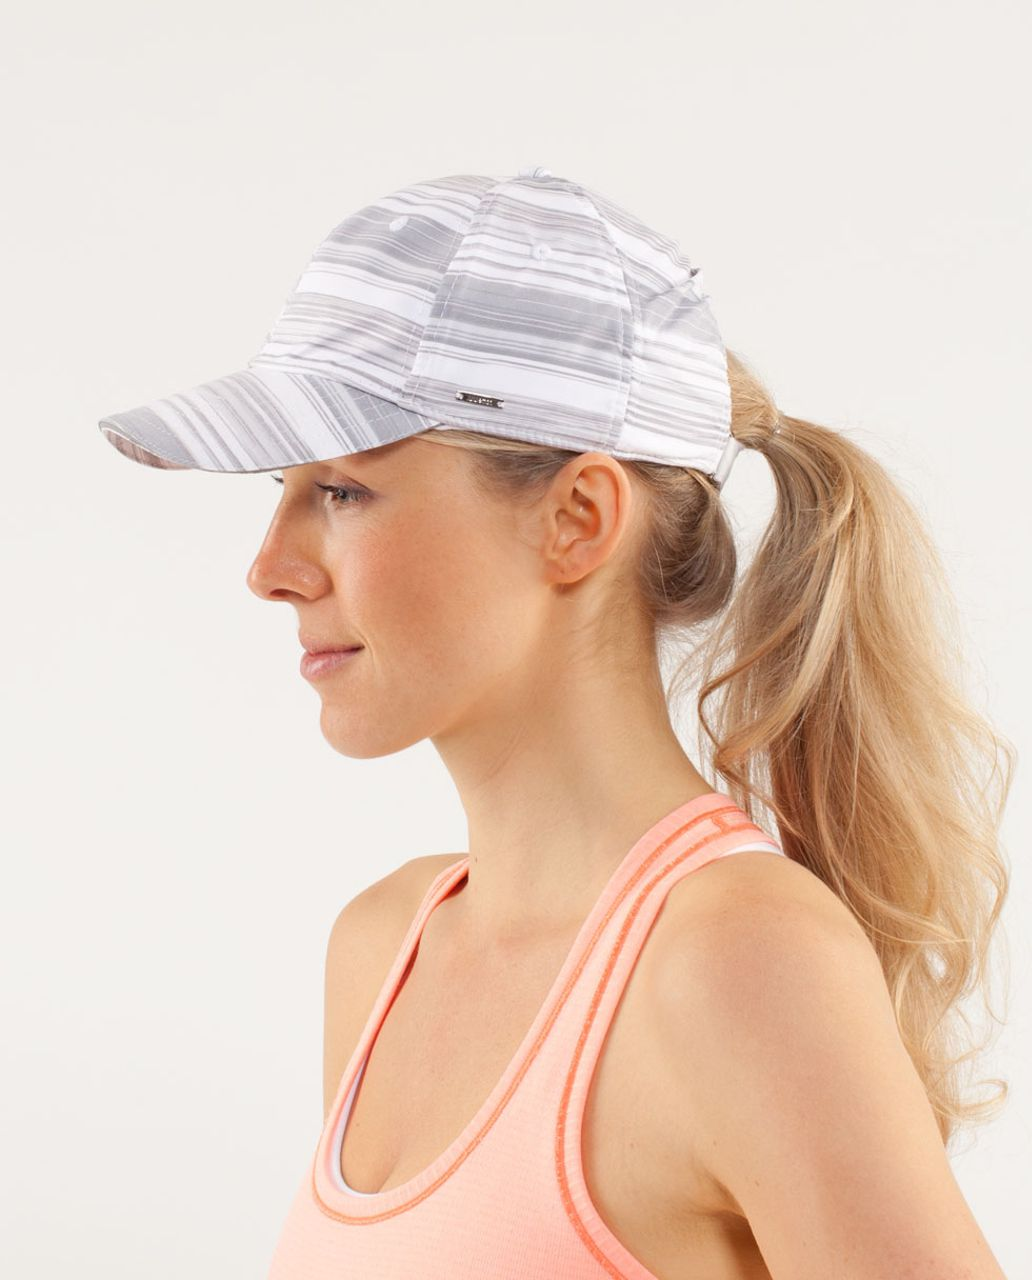 Lululemon Women's Cross Training Cap - Elevation Stripe White